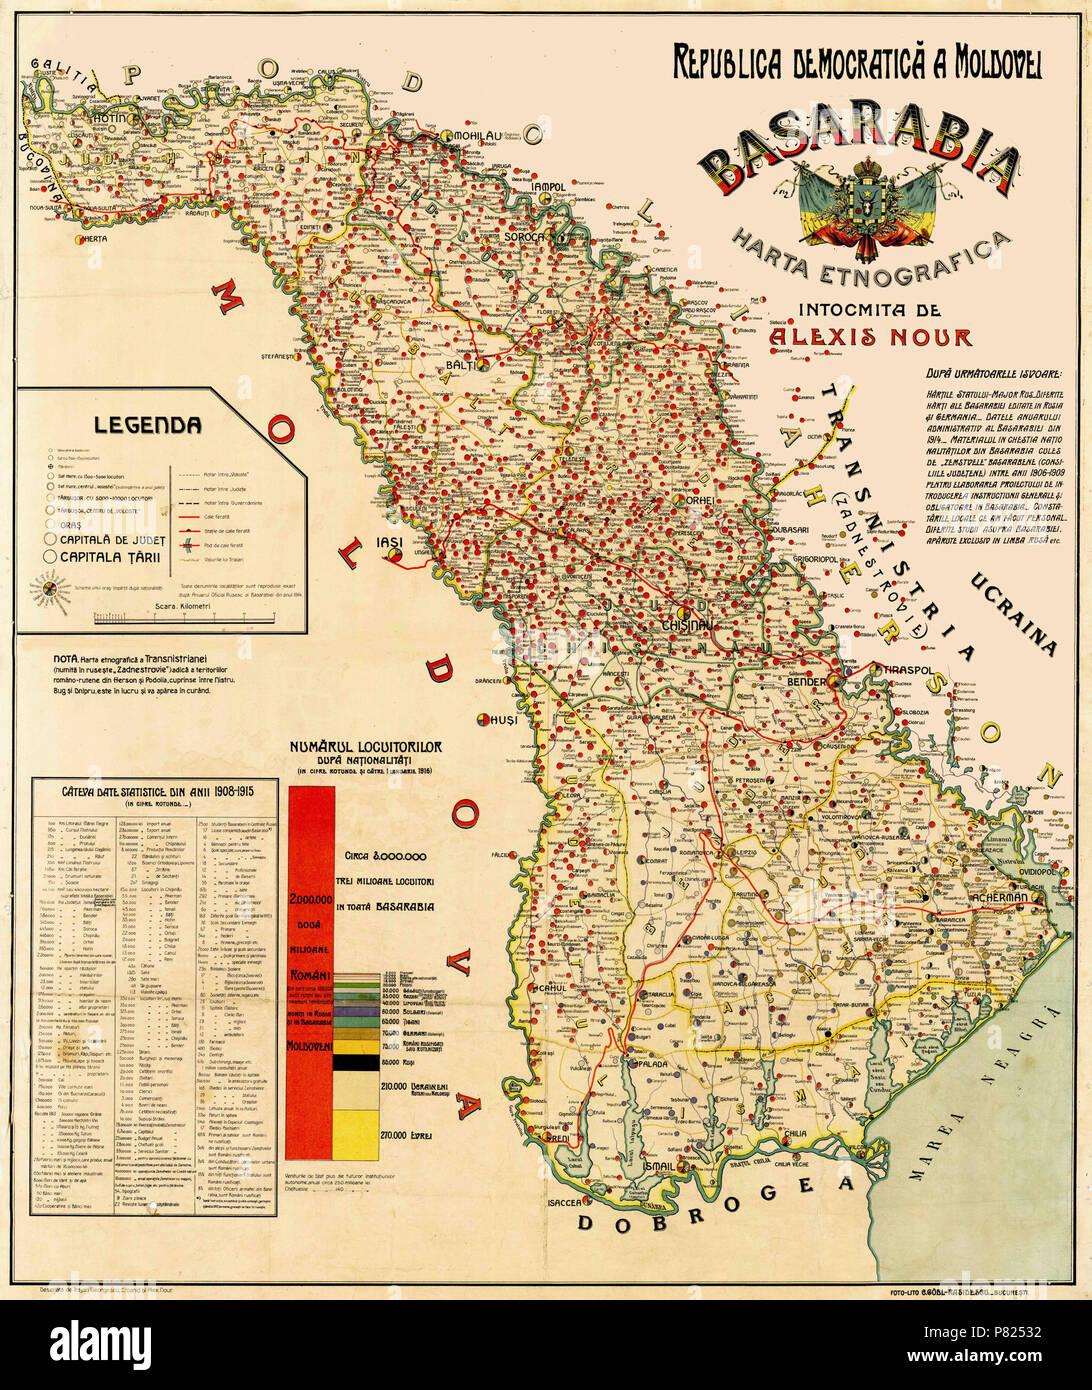 Roman Harta Republicii Democratice A Moldovei Basarabia 1918